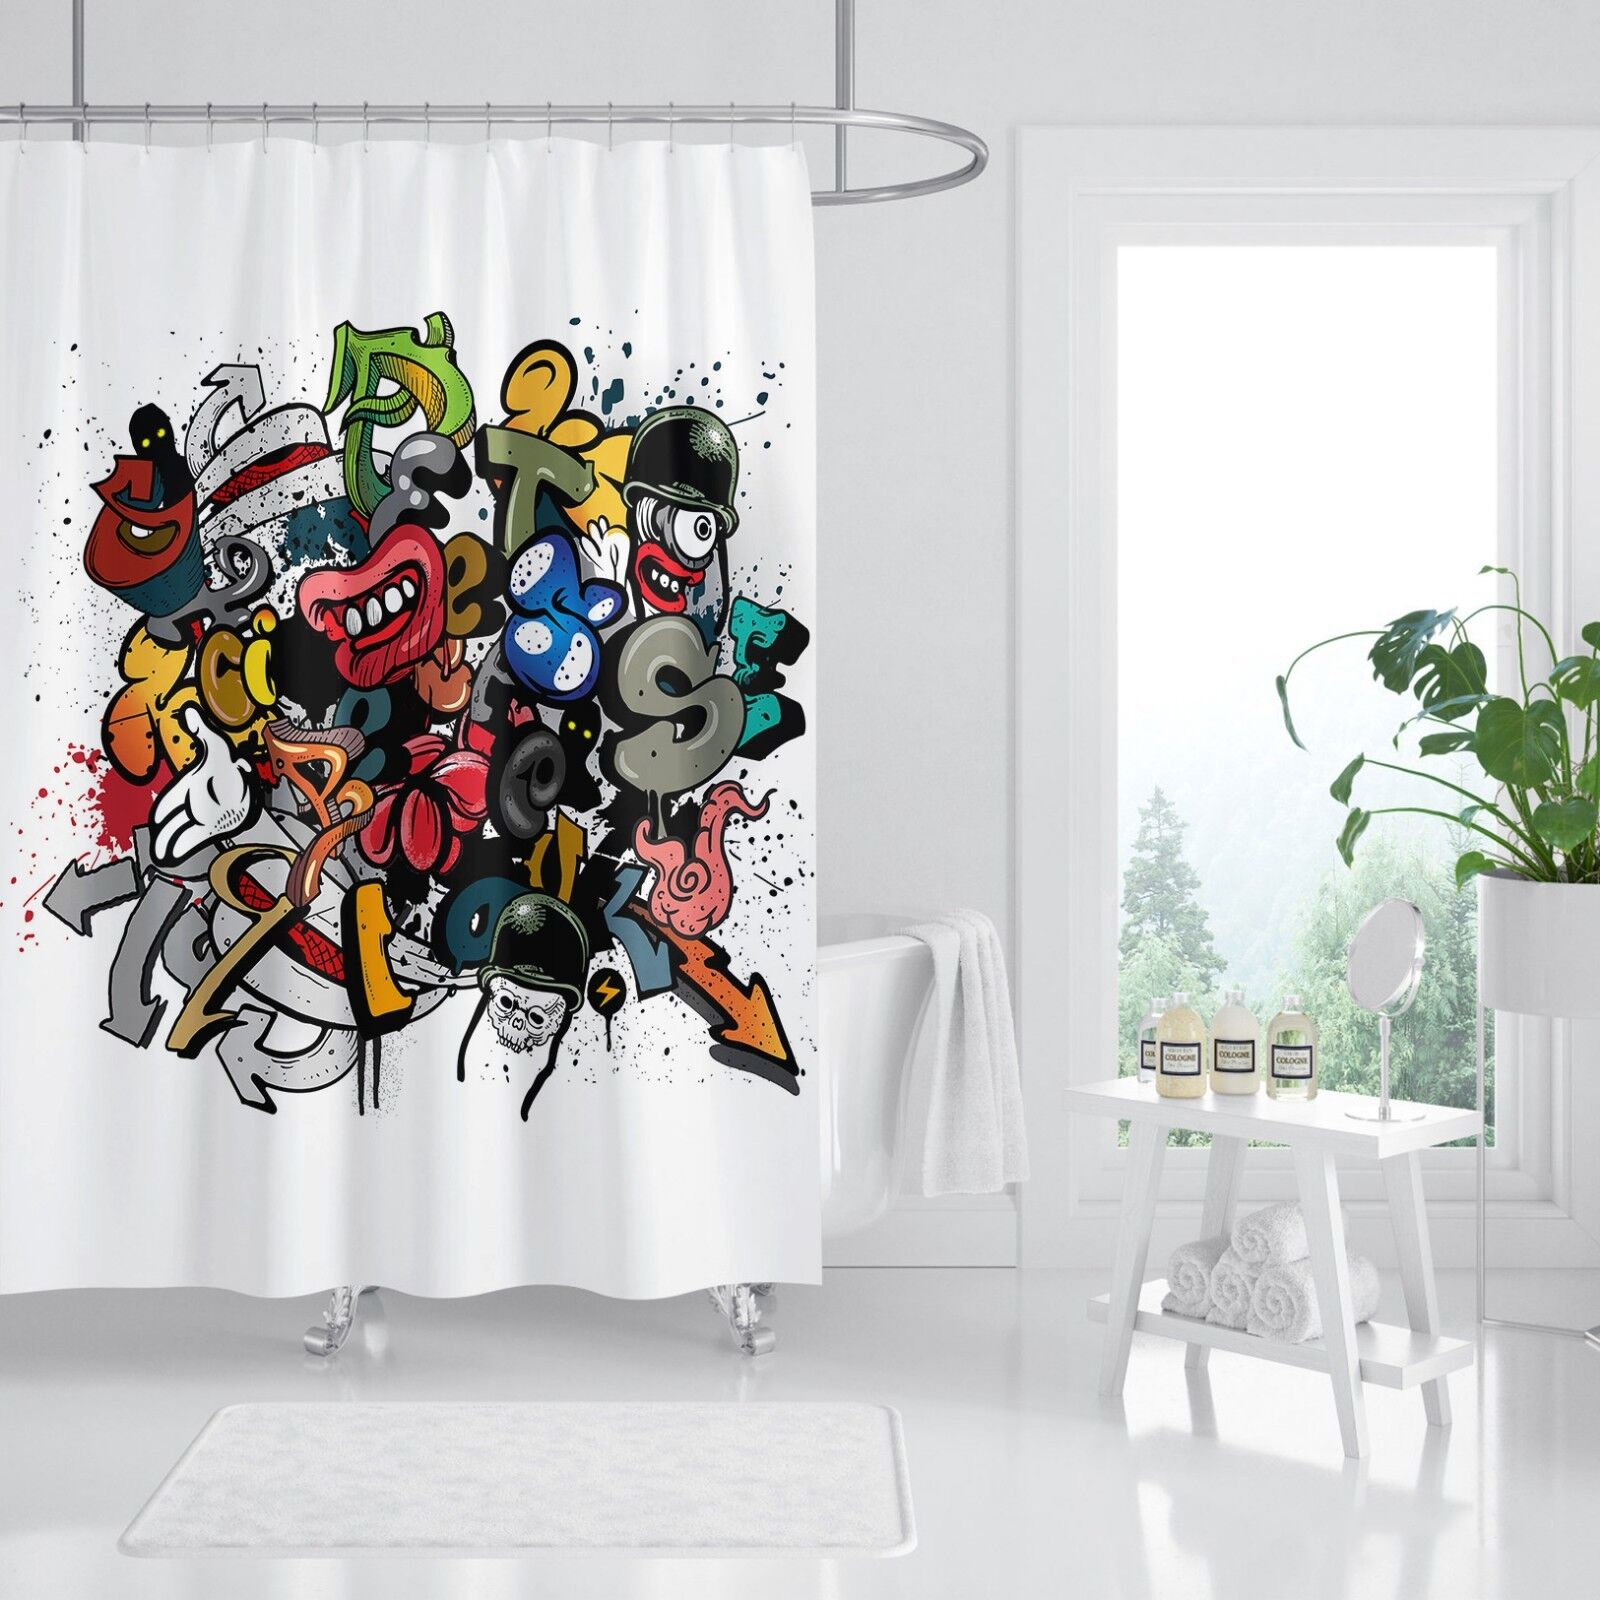 3D Cartoon Comic Comic Comic 8 Shower Curtain Waterproof Fiber Bathroom Home Windows Toilet 8035c6